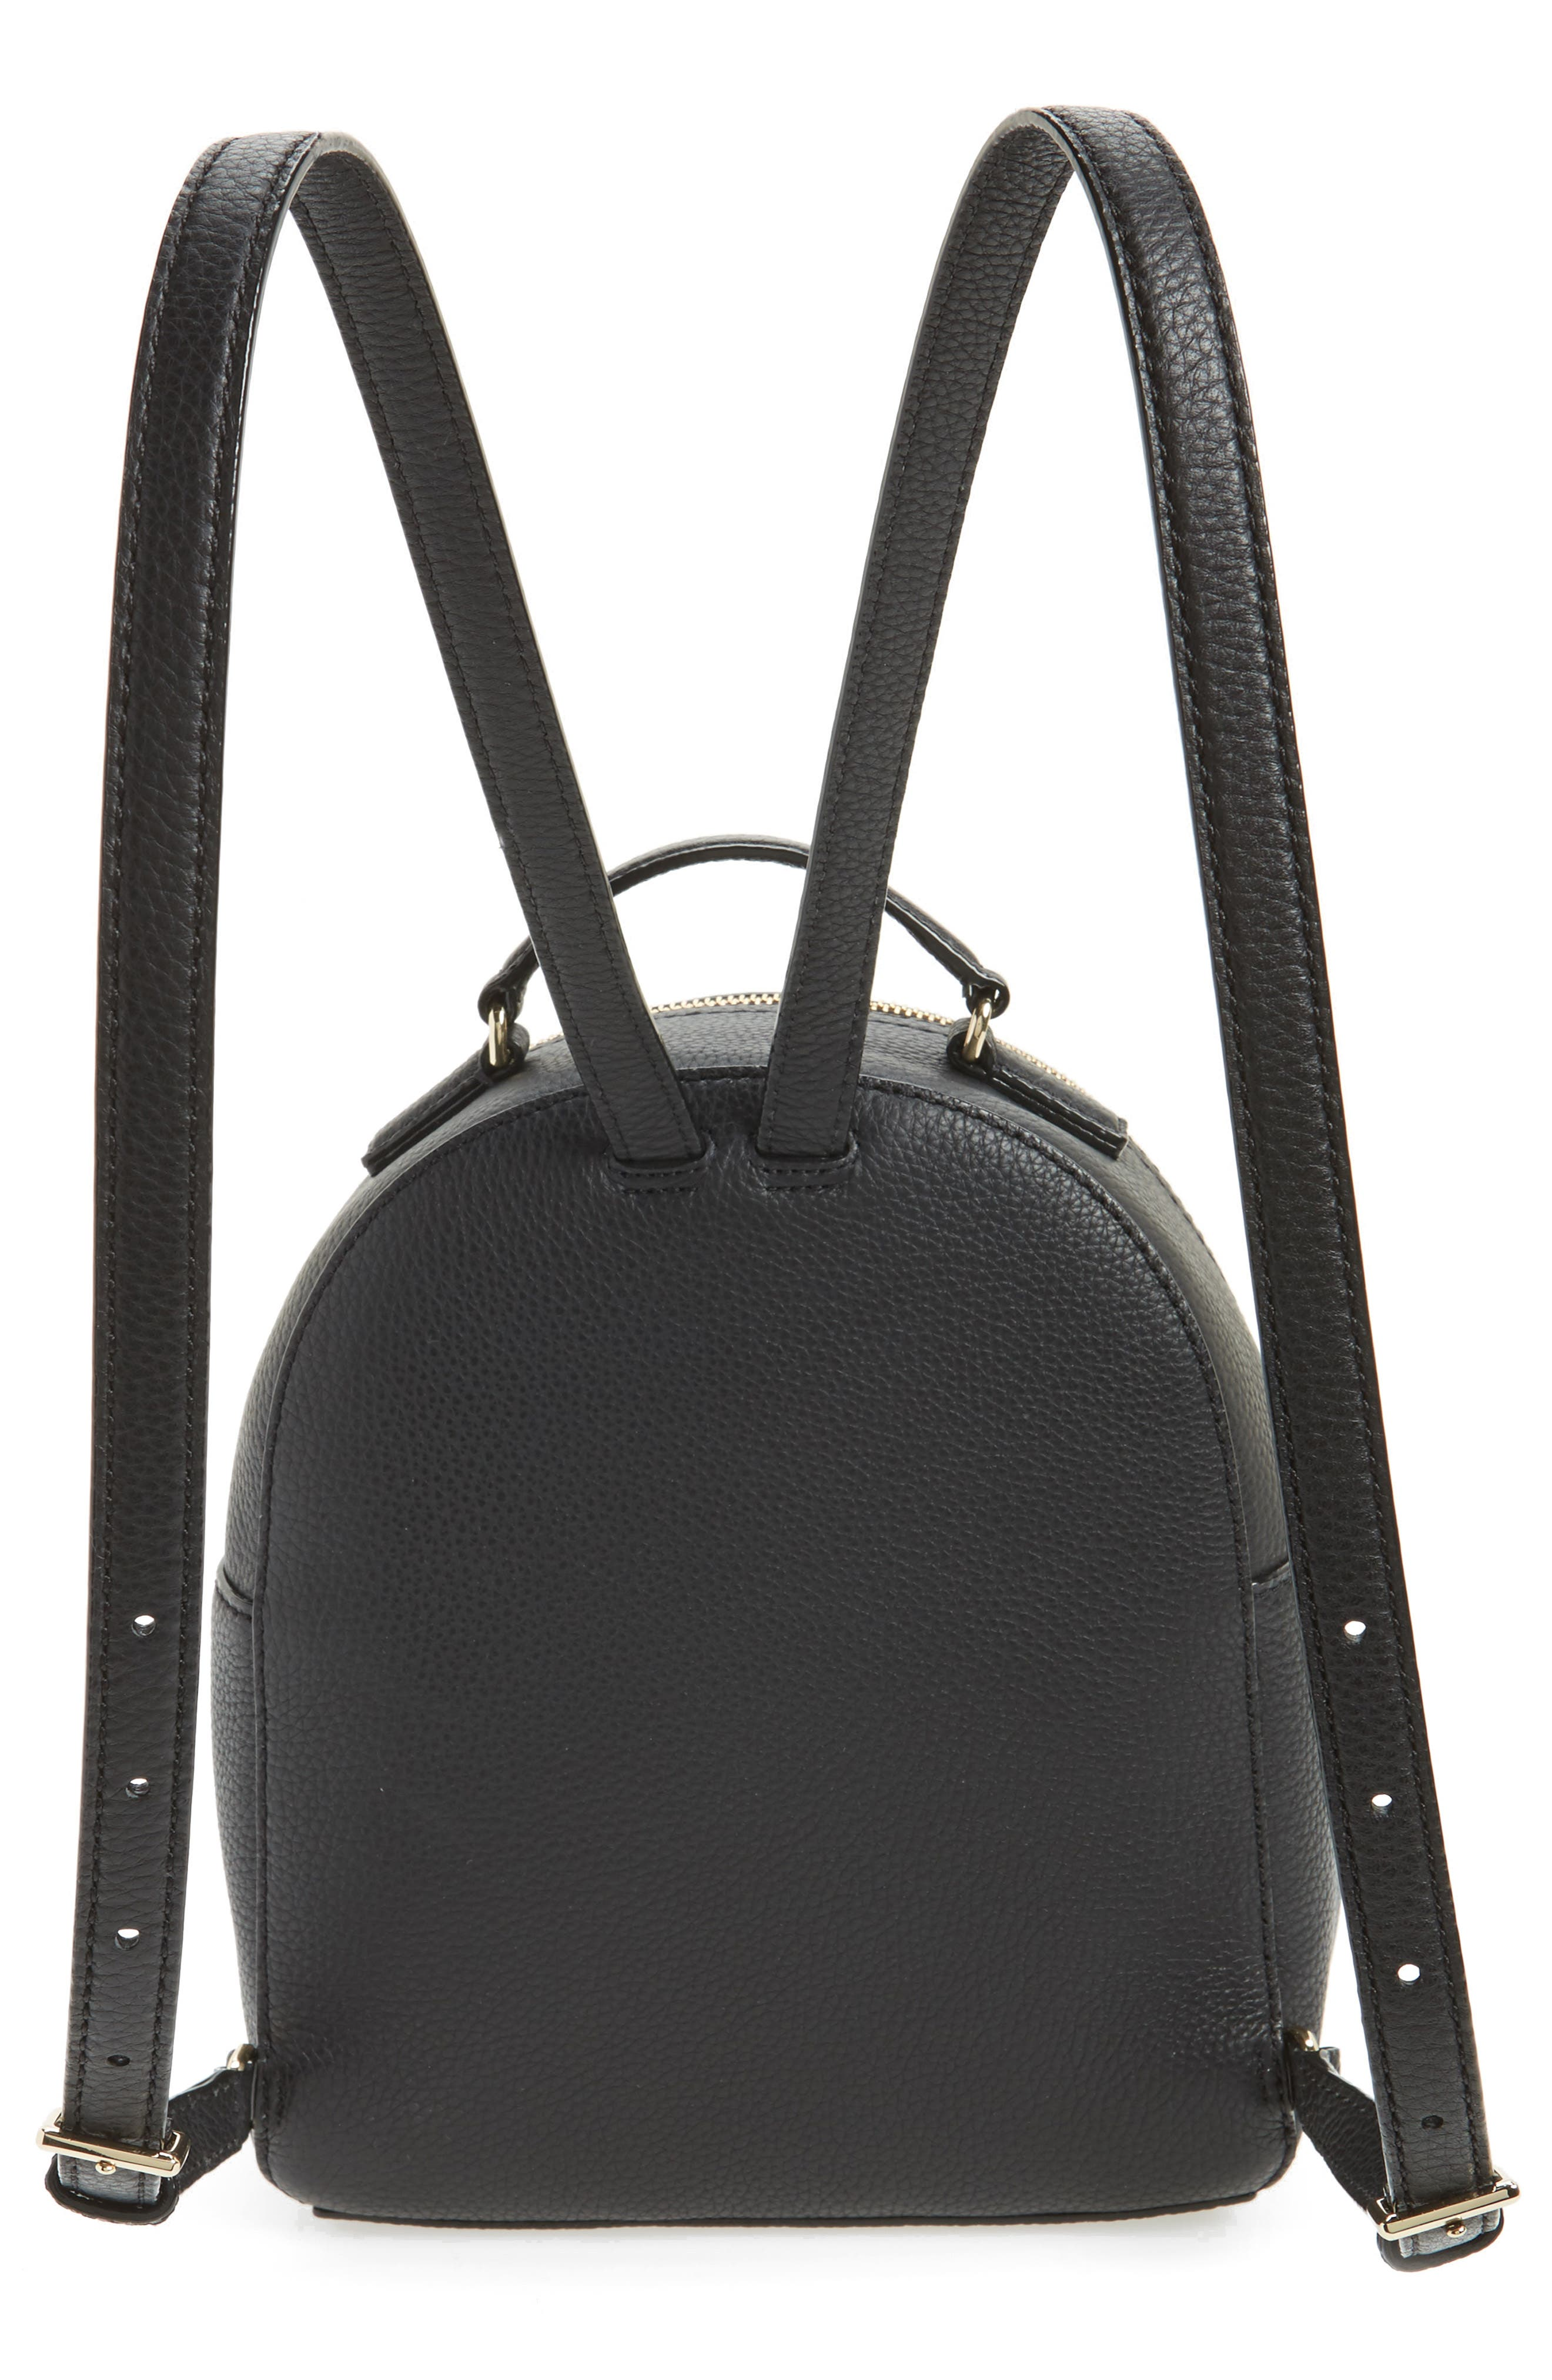 KATE SPADE NEW YORK, jackson street - keleigh leather backpack, Alternate thumbnail 3, color, 001